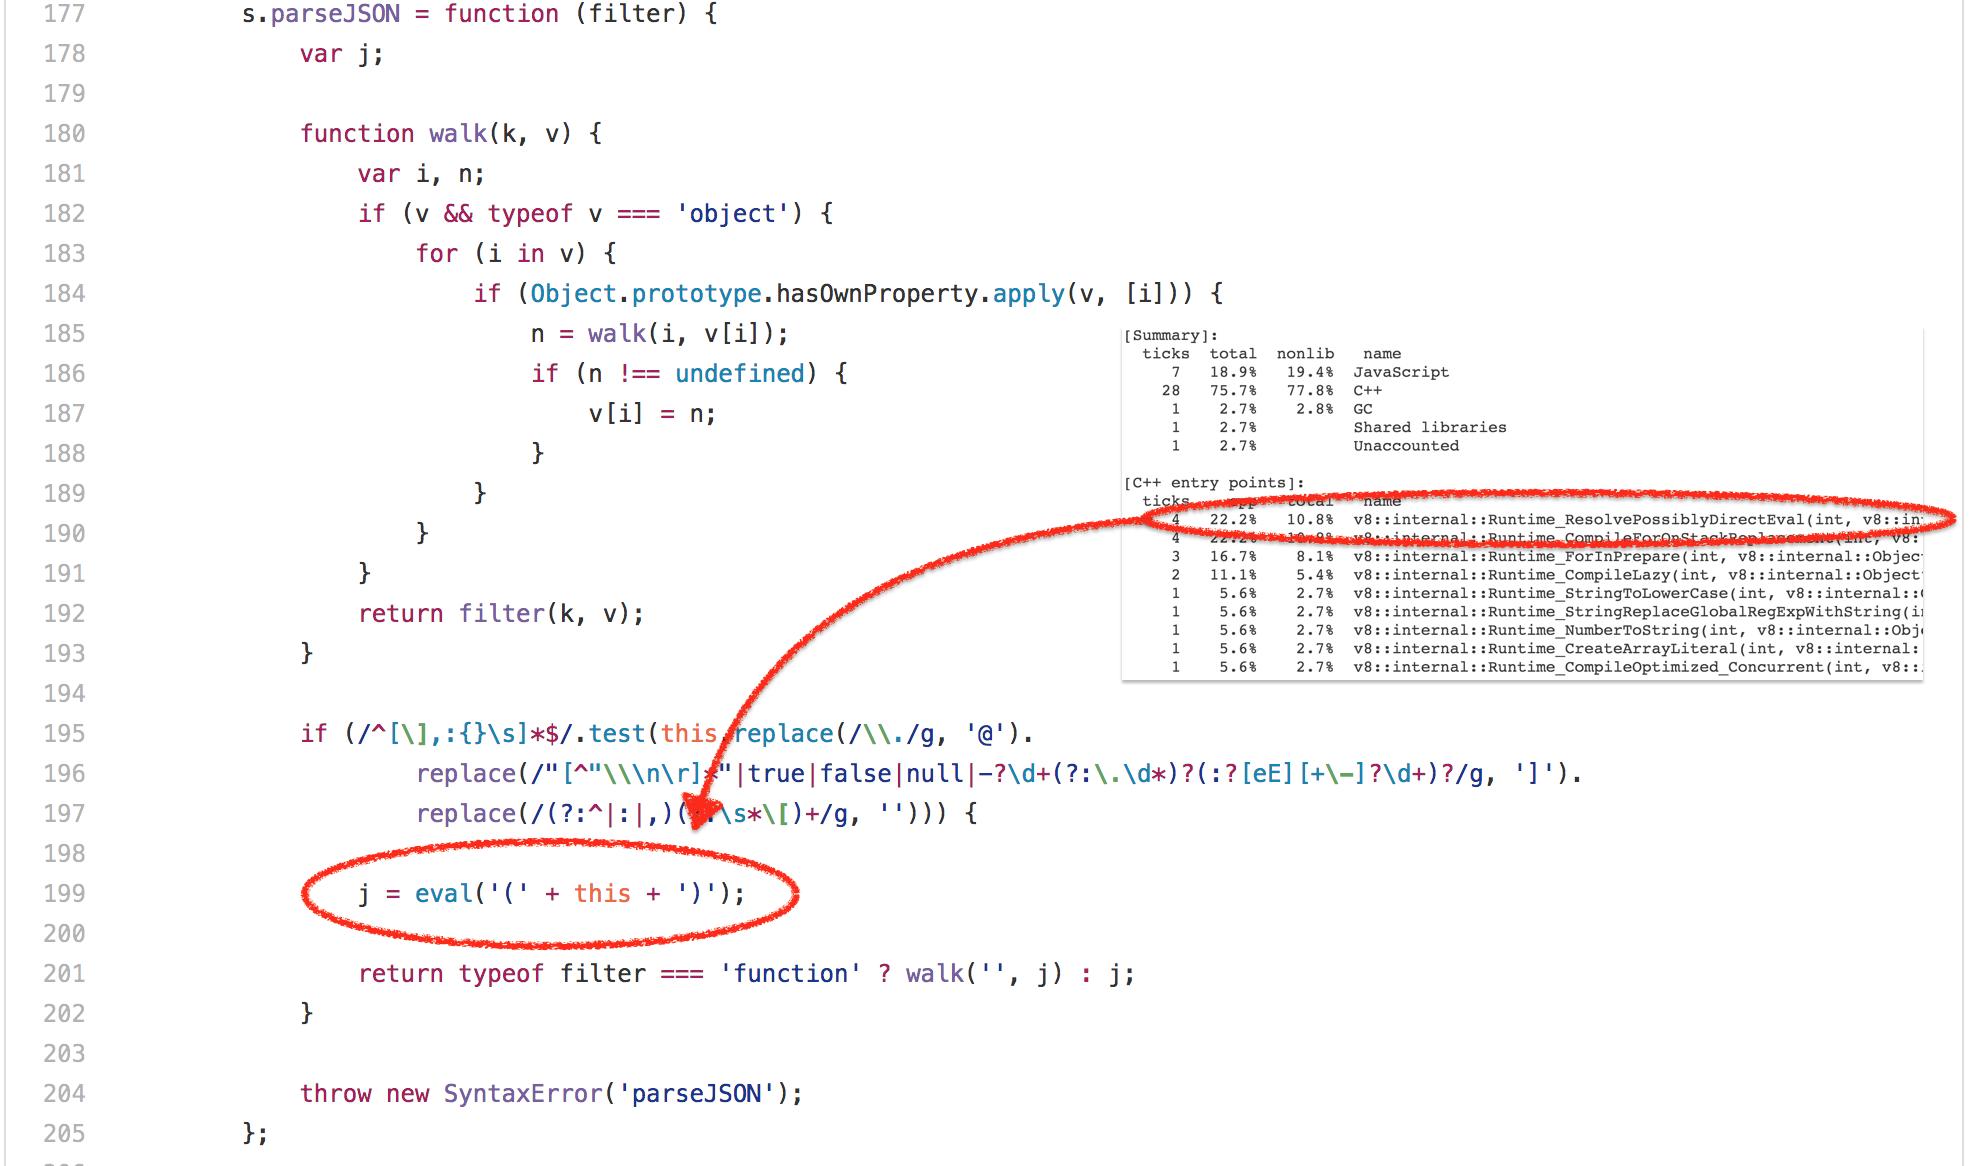 string-tagcloud.js